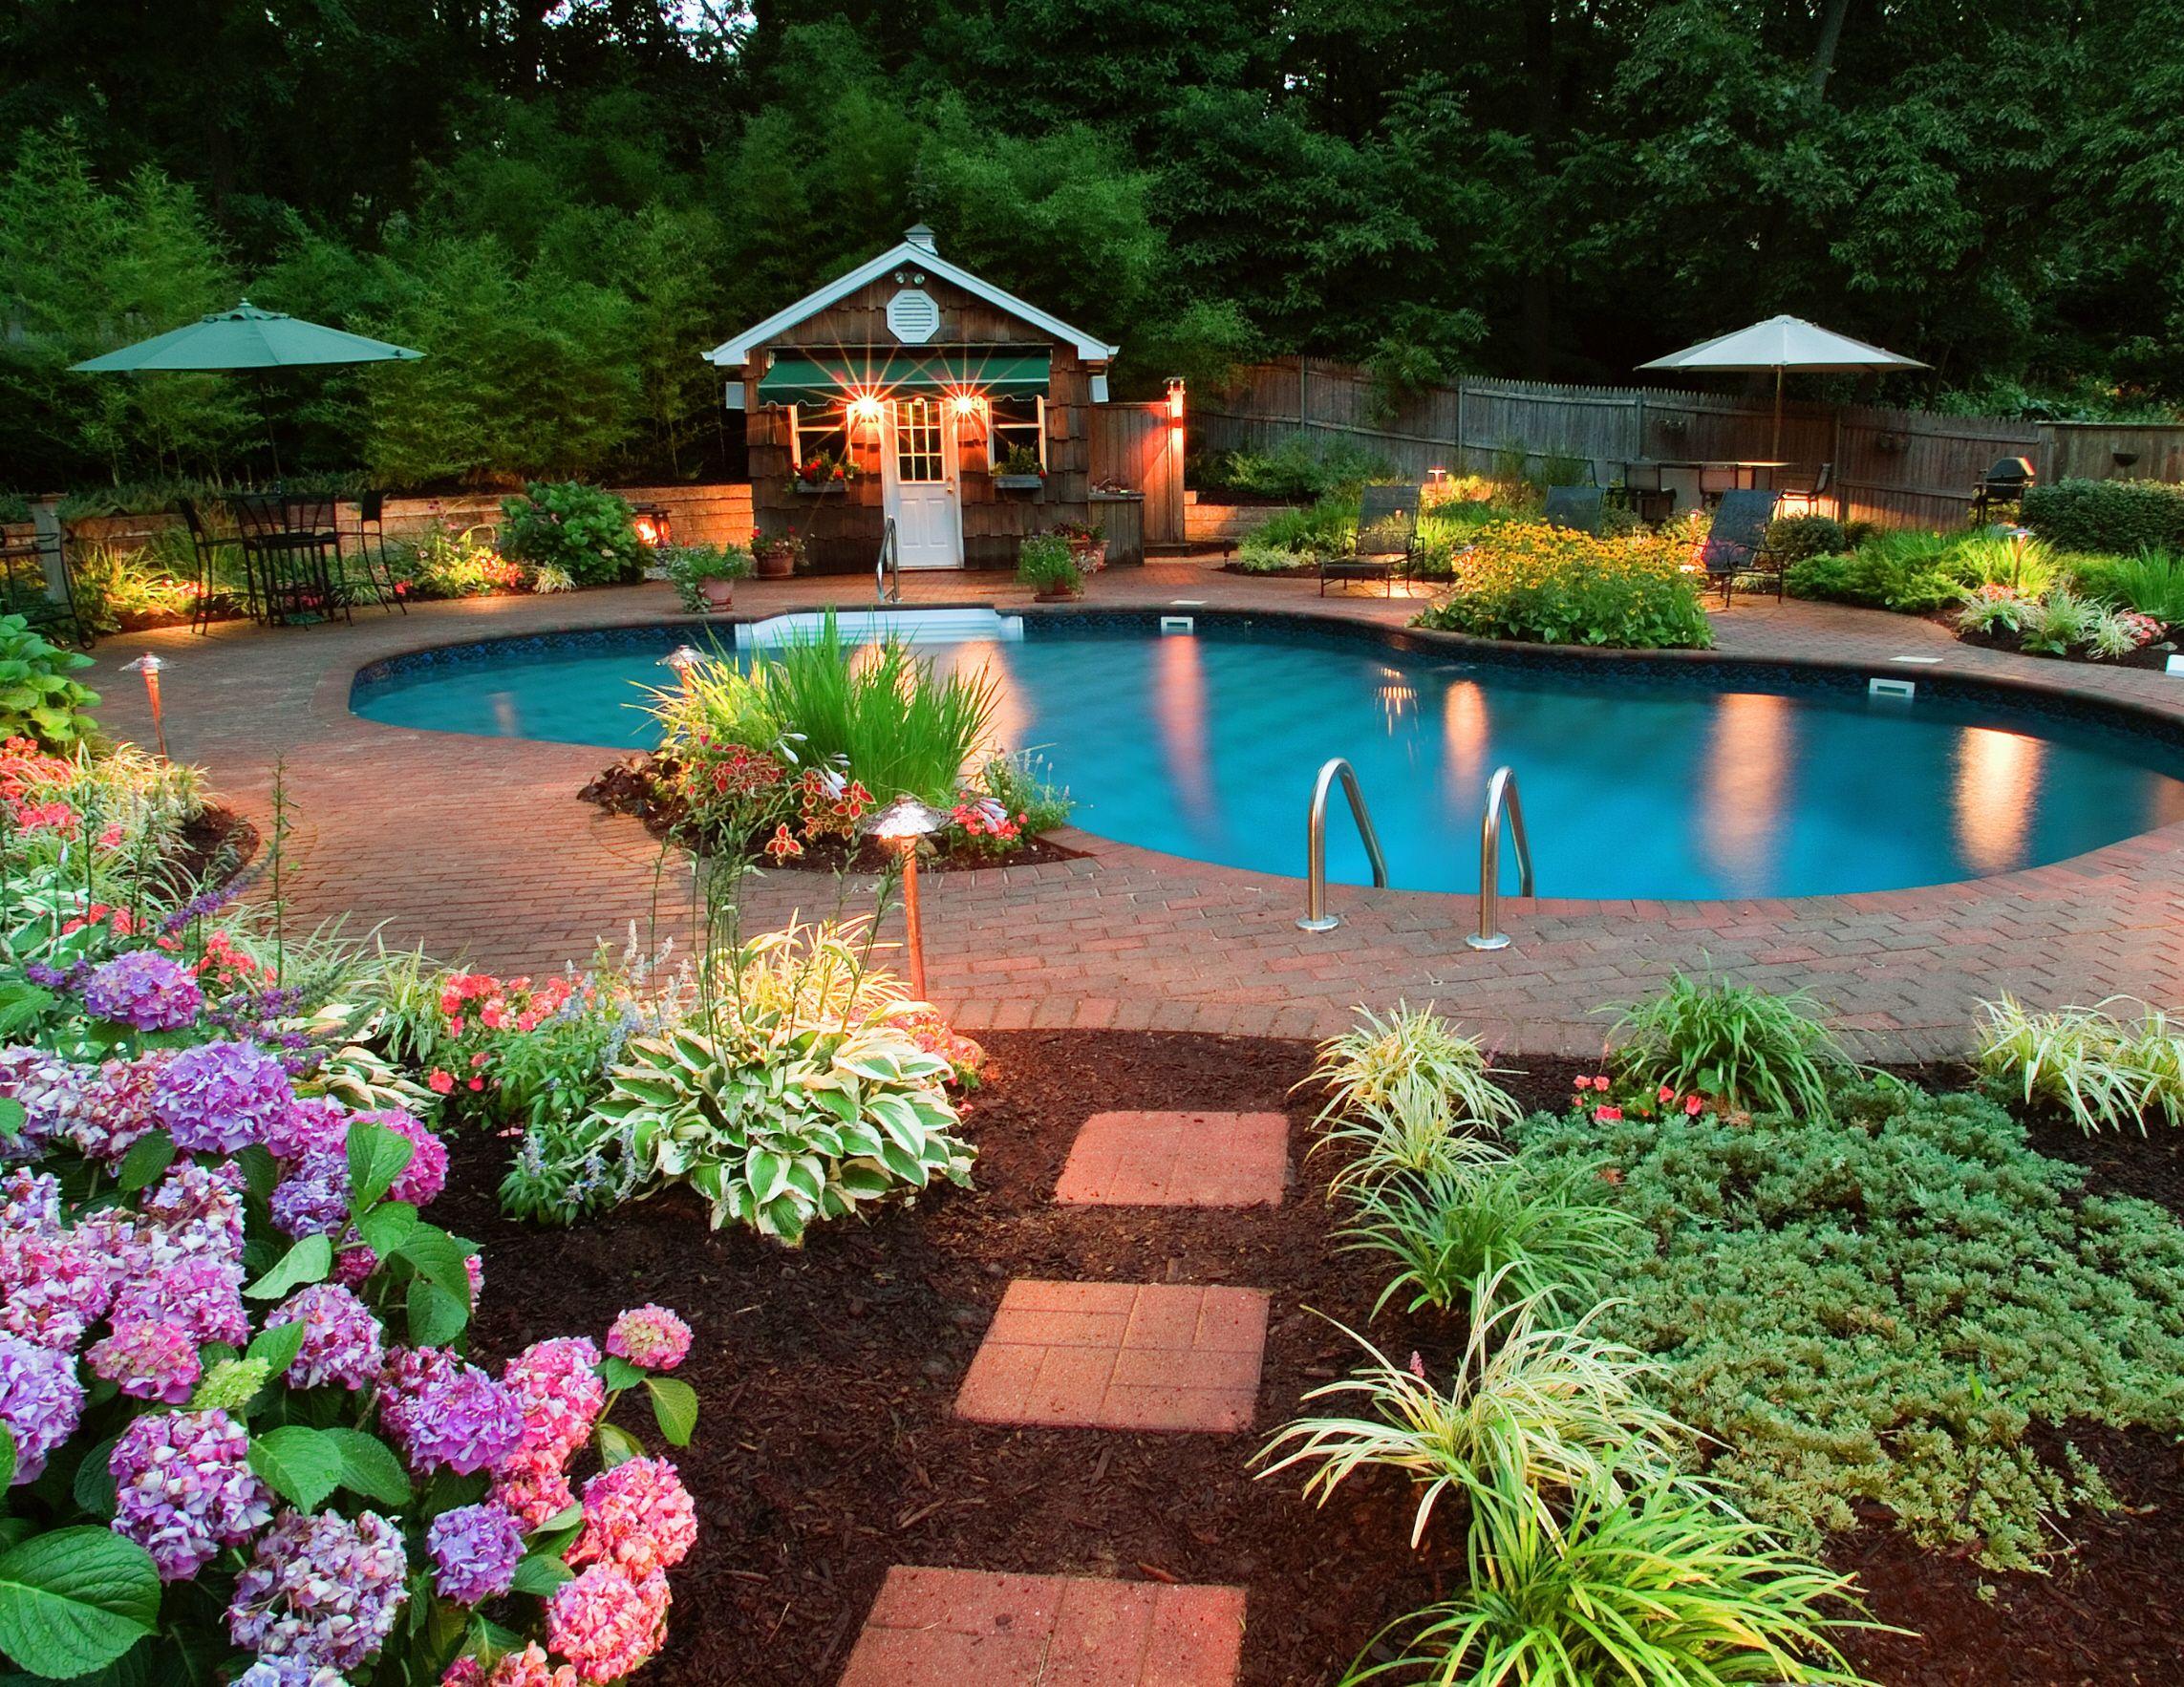 Backyard With Pool stunning backyard design | garden + floral | pinterest | backyard